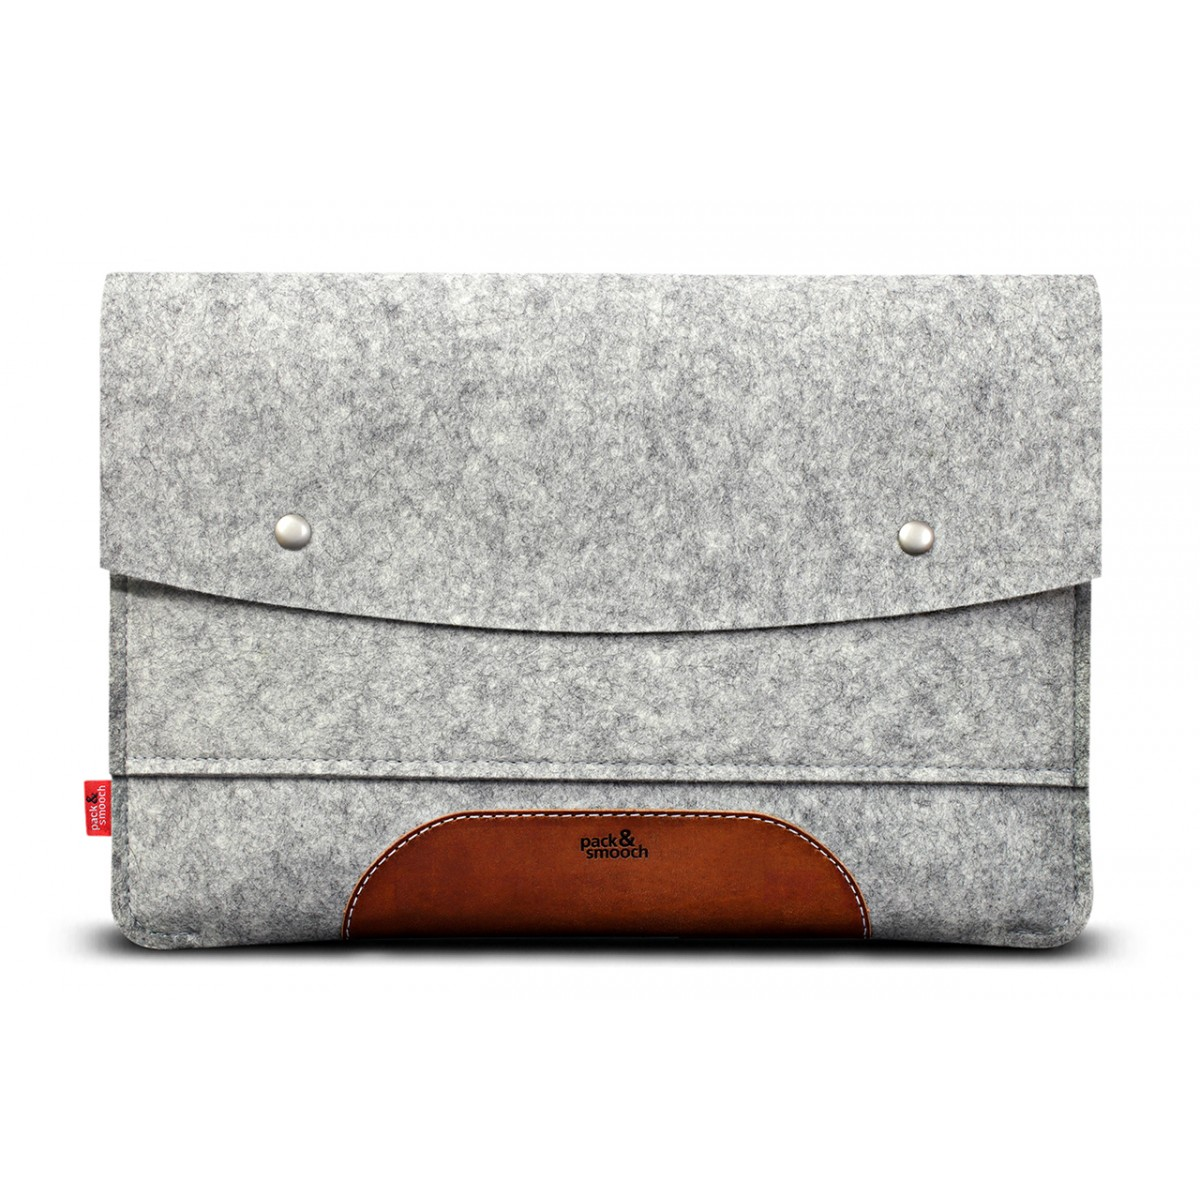 "Pack & Smooch iPad Pro 11"" Hülle, Case ""Hampshire"" 100% Merino Wollfilz, Pflanzlich gegerbtes Leder"